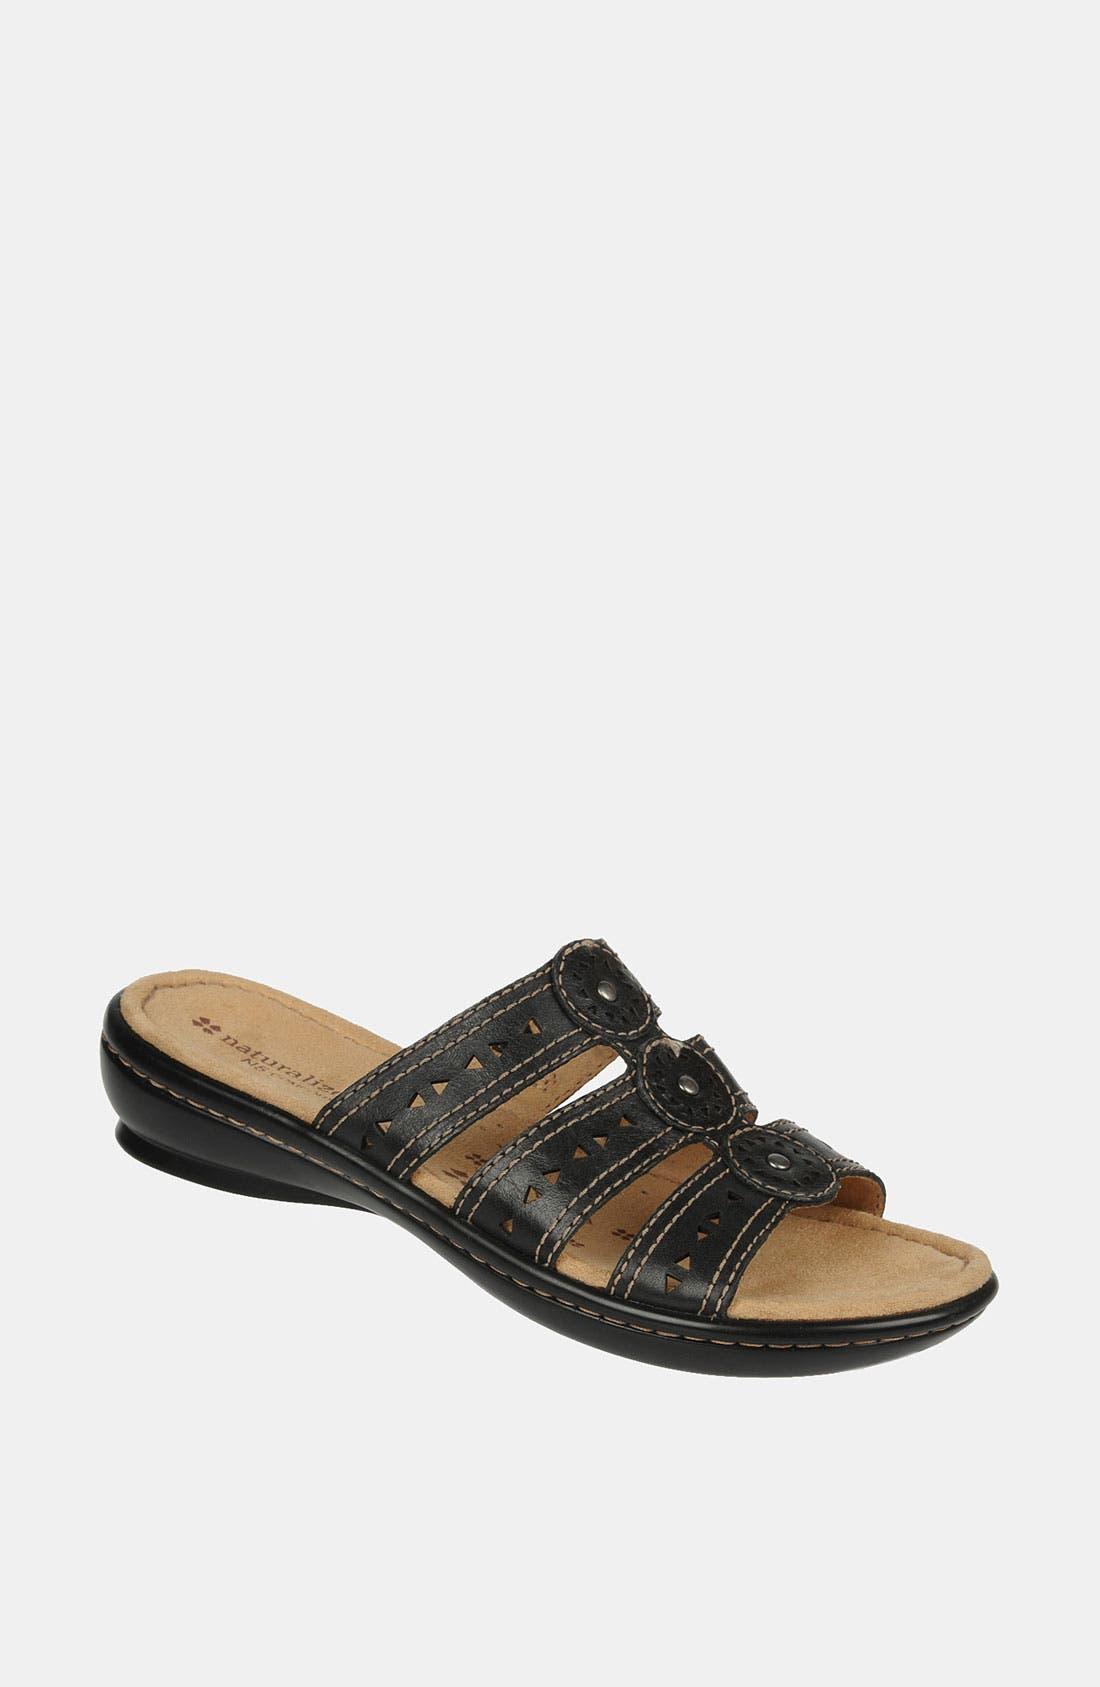 Alternate Image 1 Selected - Naturalizer 'Janae' Sandal